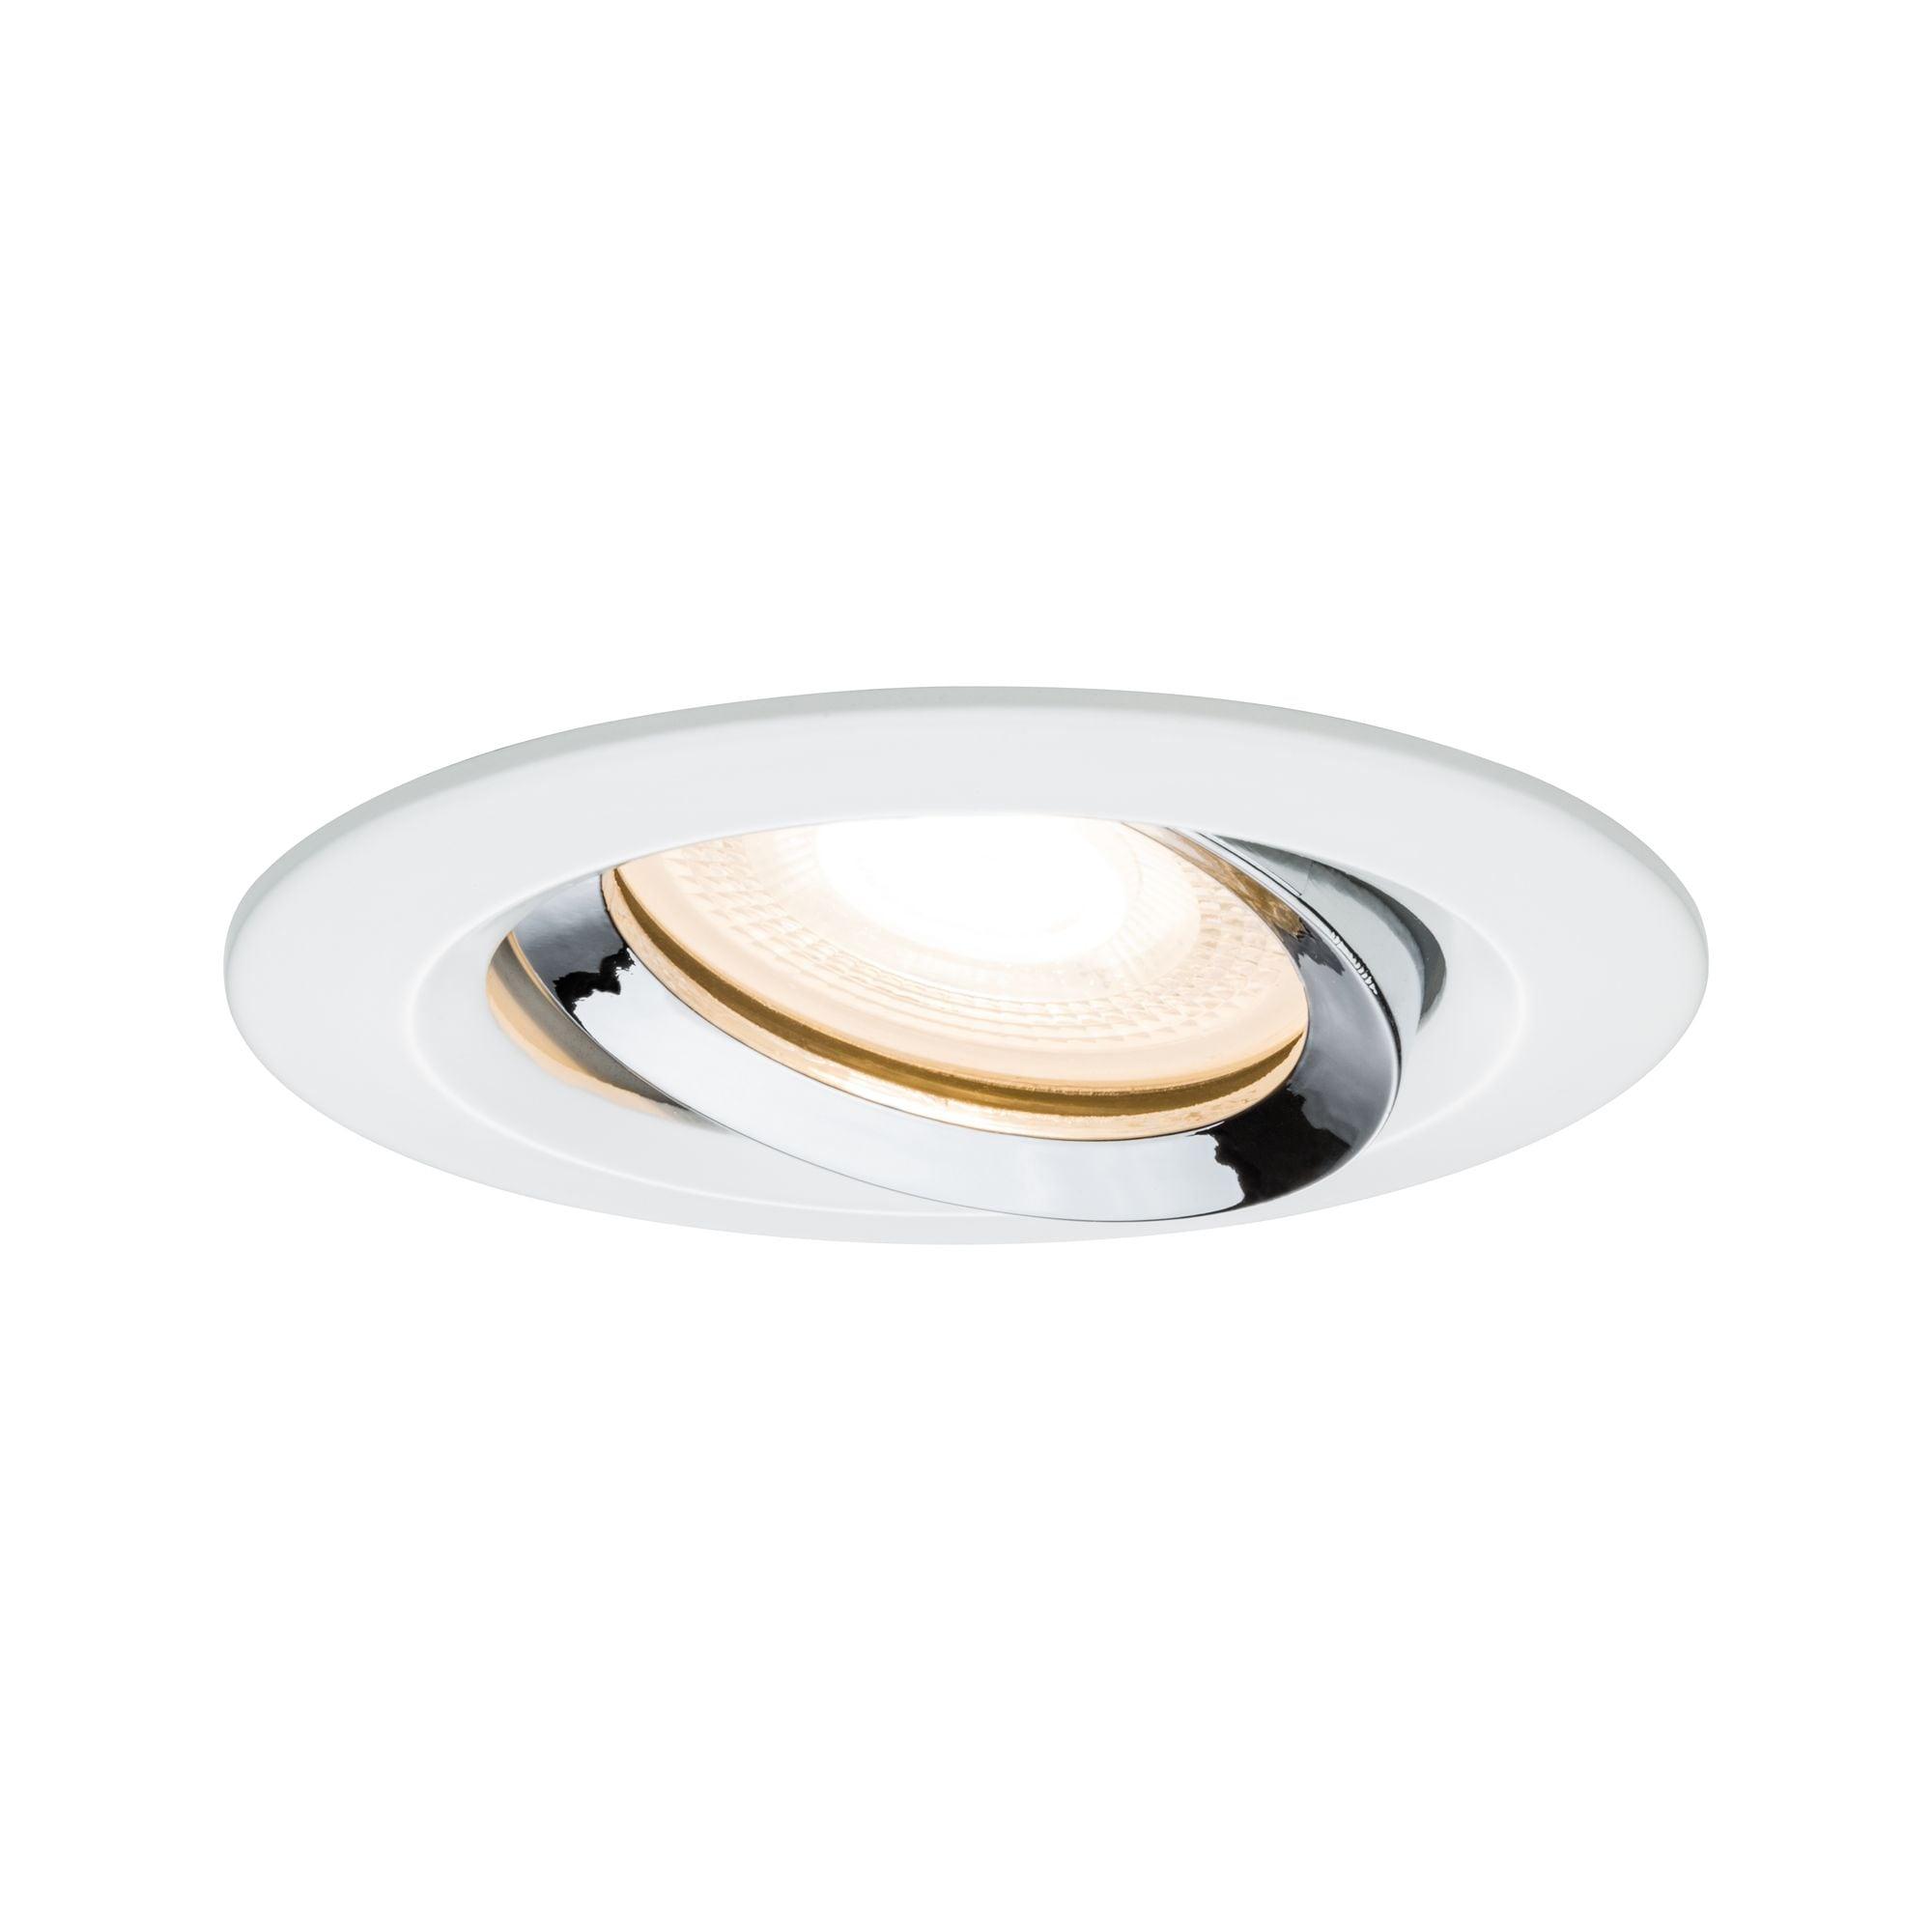 Paulmann,LED Einbaustrahler Nova IP65 rund max. 35W GU10/GU5,3 Weiß/Chrom schwenkbar